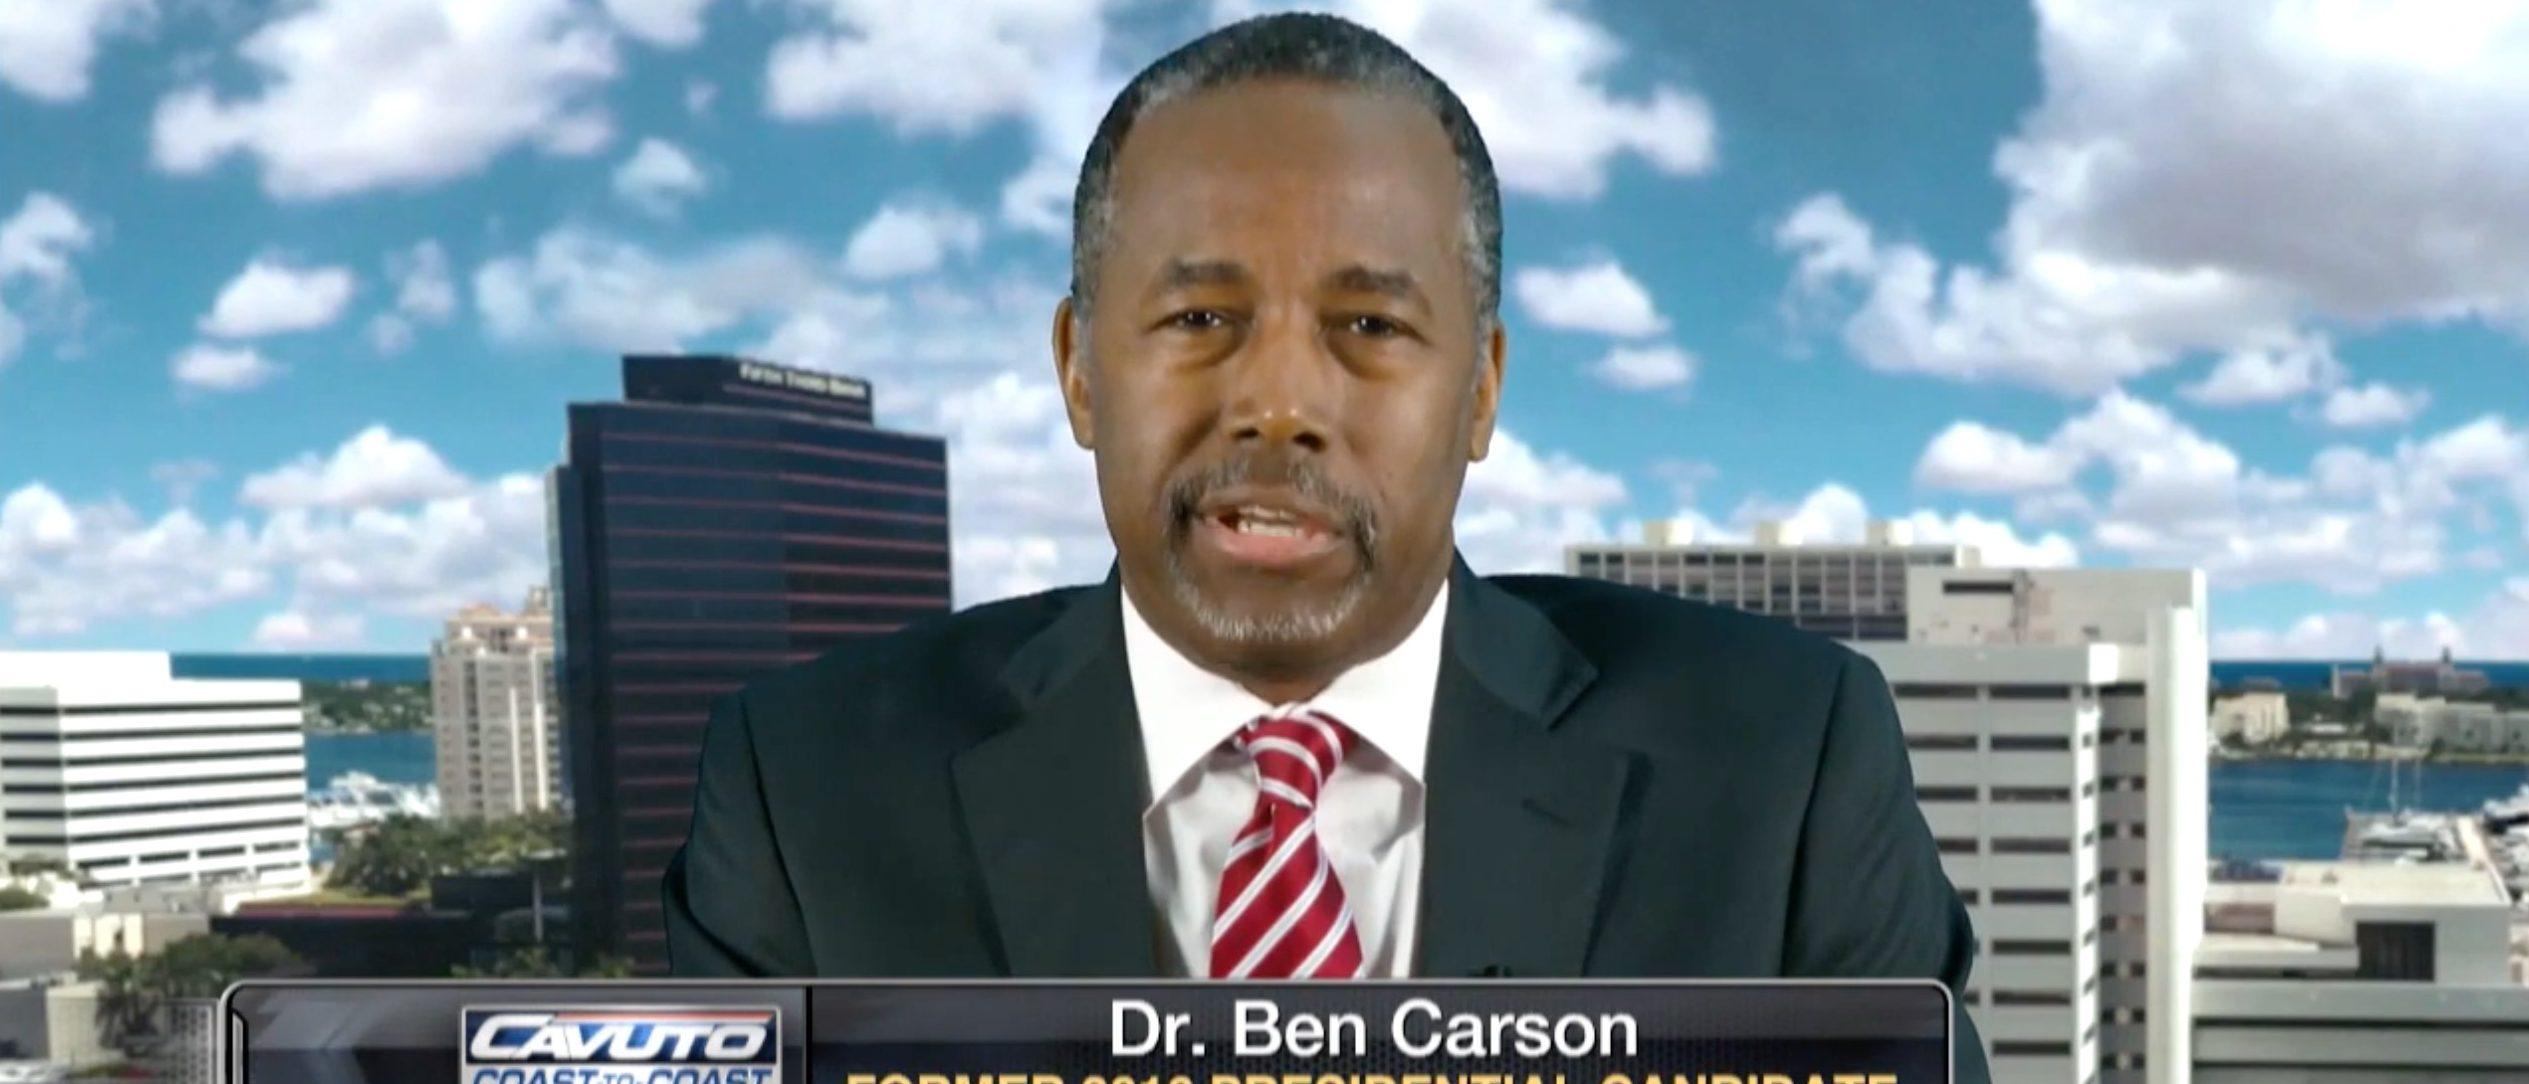 Ben Carson, Screen Grab FBN, 8-3-2016